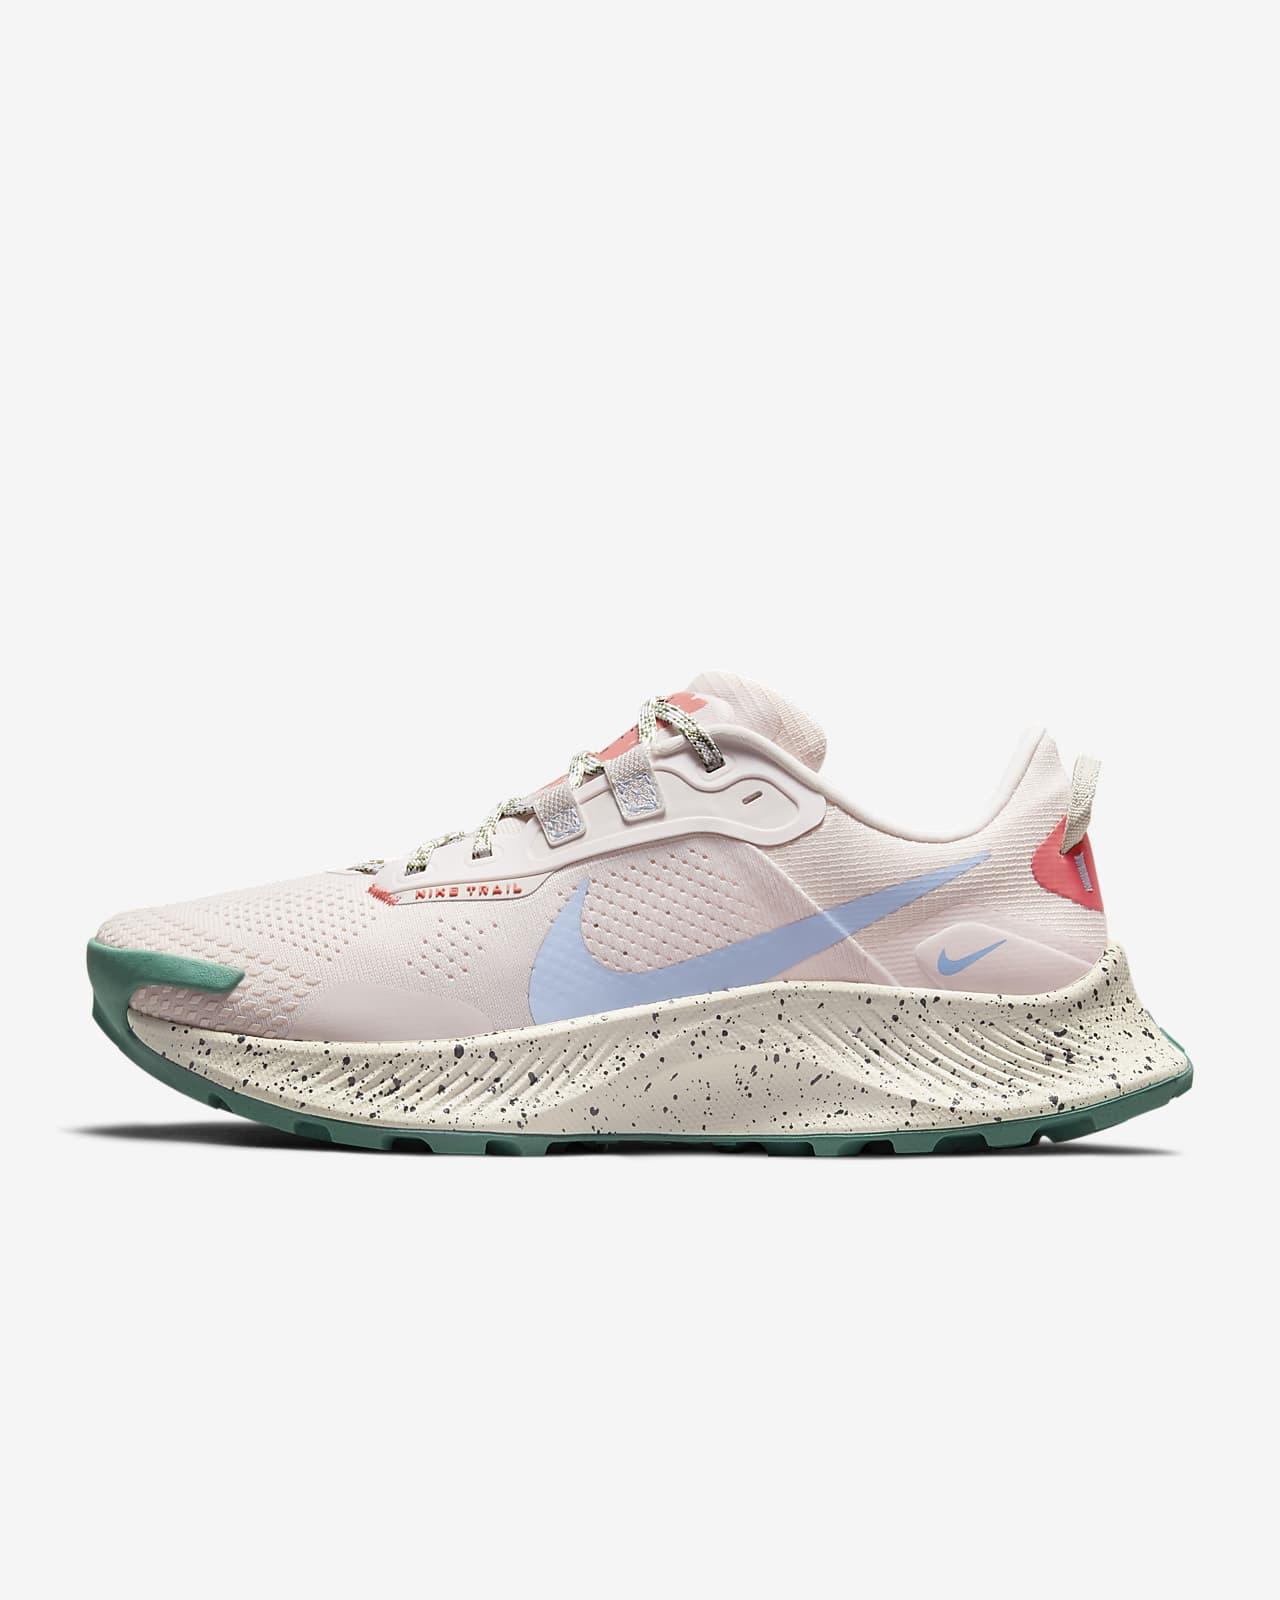 Sapatilhas de running para trilhos Nike Pegasus Trail 3 para mulher